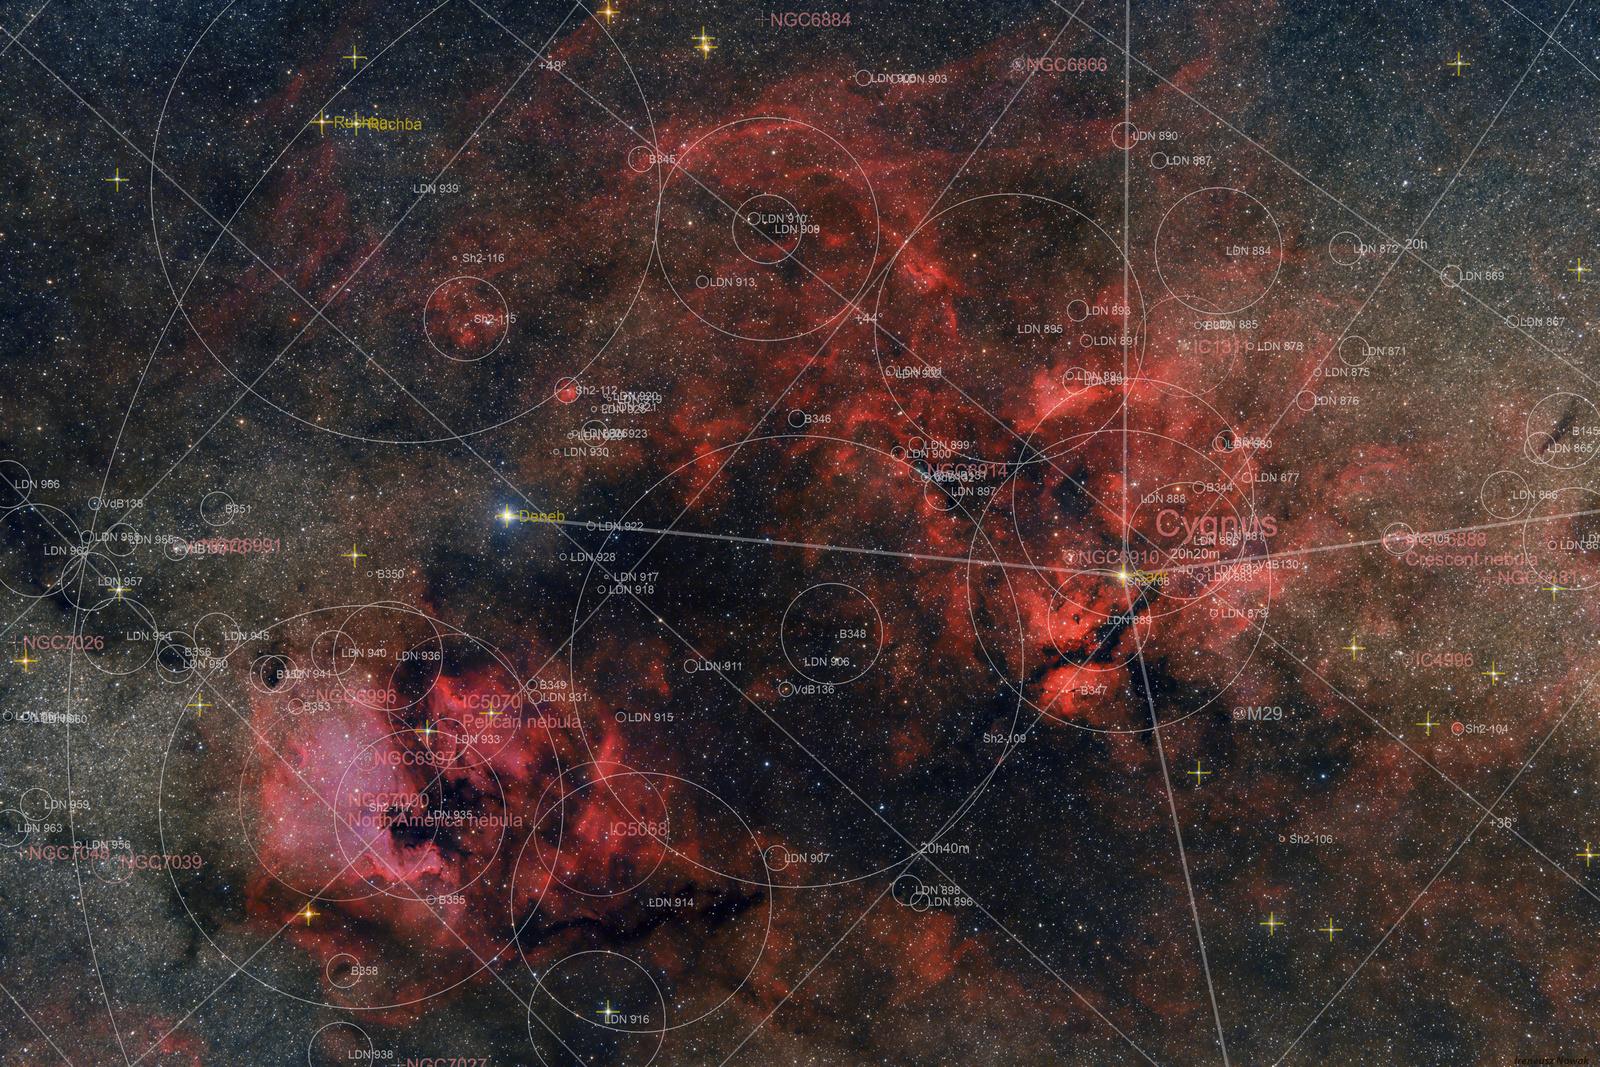 cygnus-2019-07-11-final_ano.thumb.jpg.81d32b4fc4d5f9c771c90d64ac71f61e.jpg